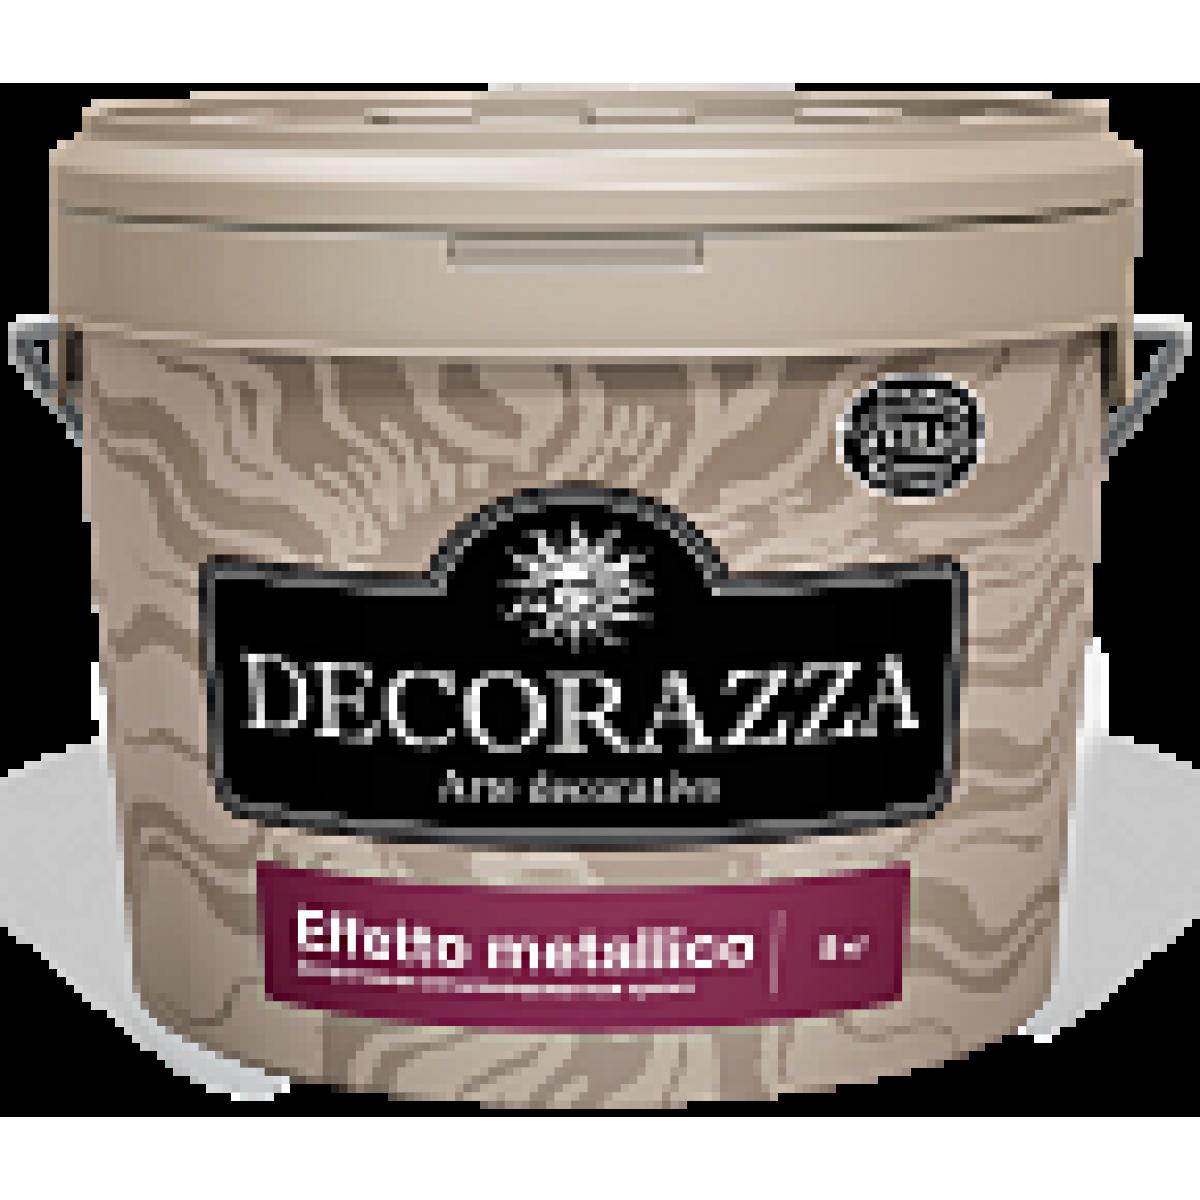 Decorazza Effetto metallico - Декоративная металлизированная краска